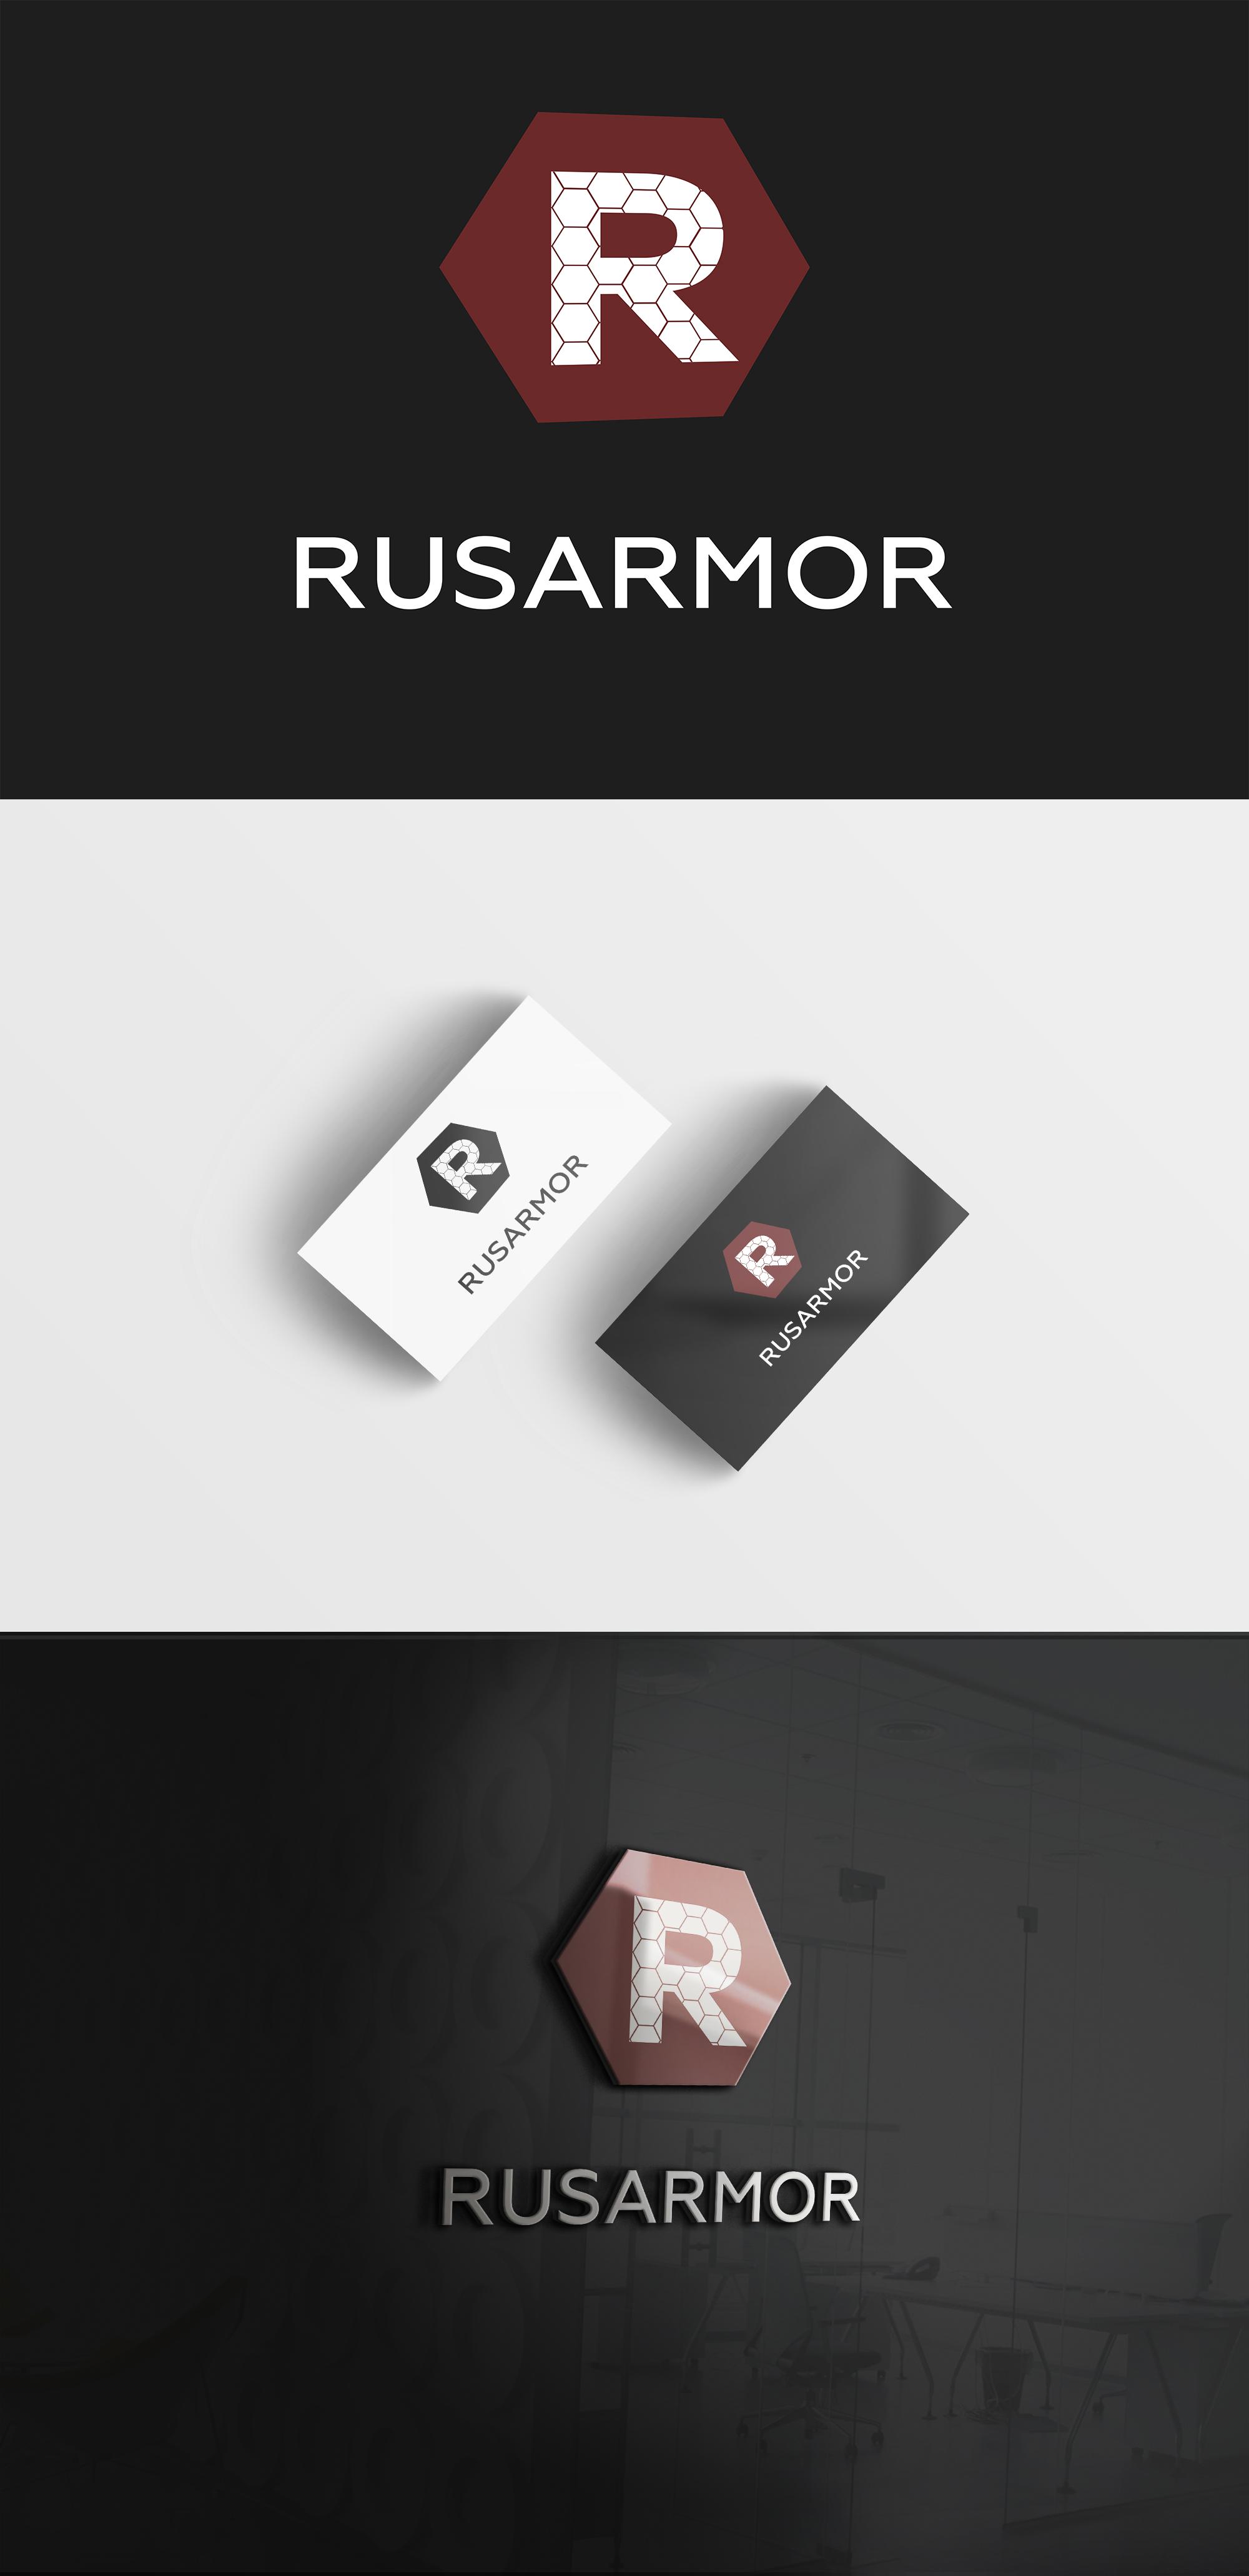 Разработка логотипа технологического стартапа РУСАРМОР фото f_5965a08fb51d942d.jpg